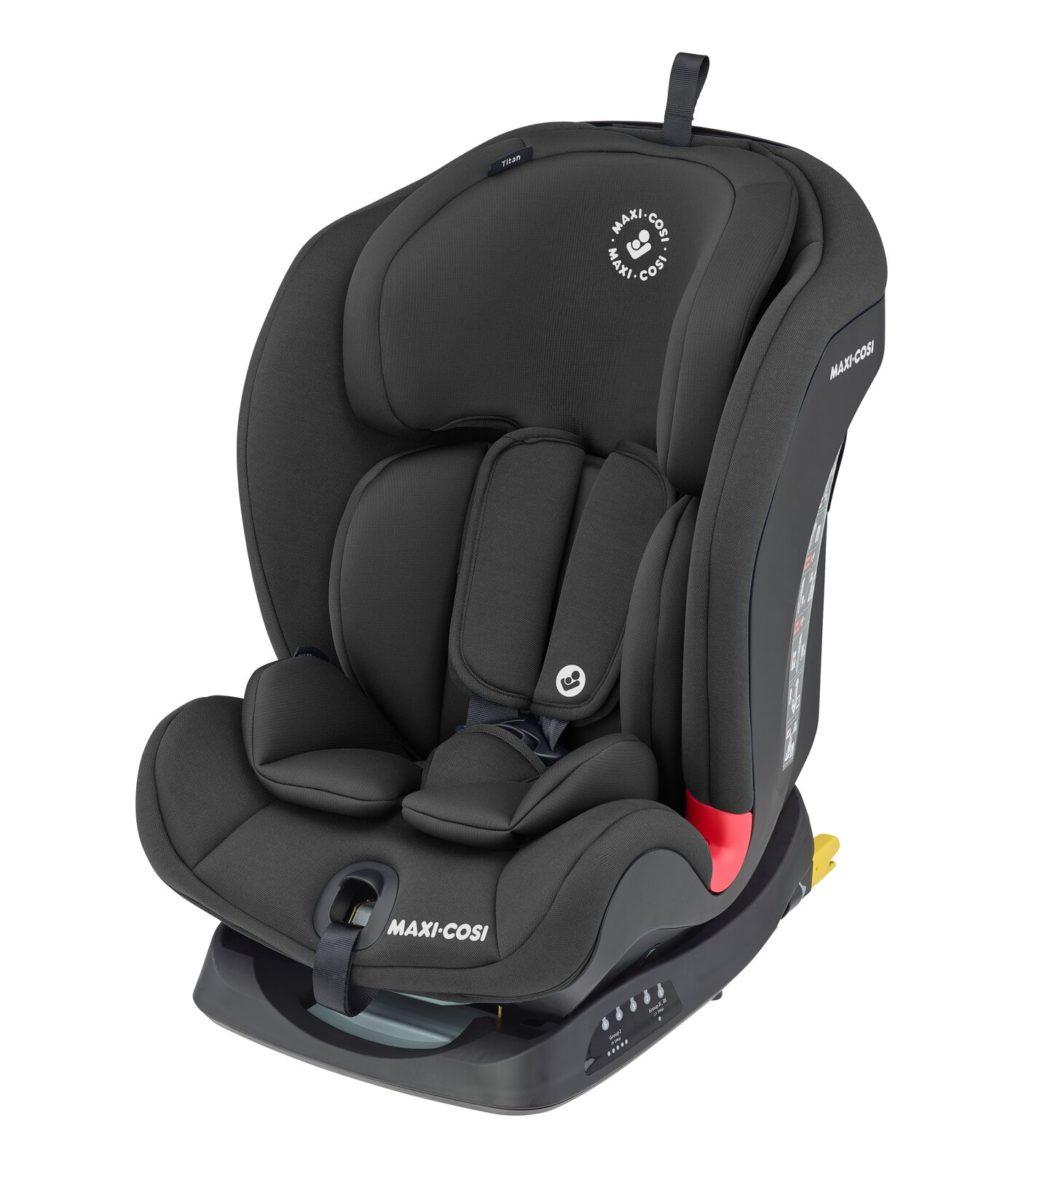 MAXI COSI Κάθισμα Αυτοκινήτου Titan BASIC Black